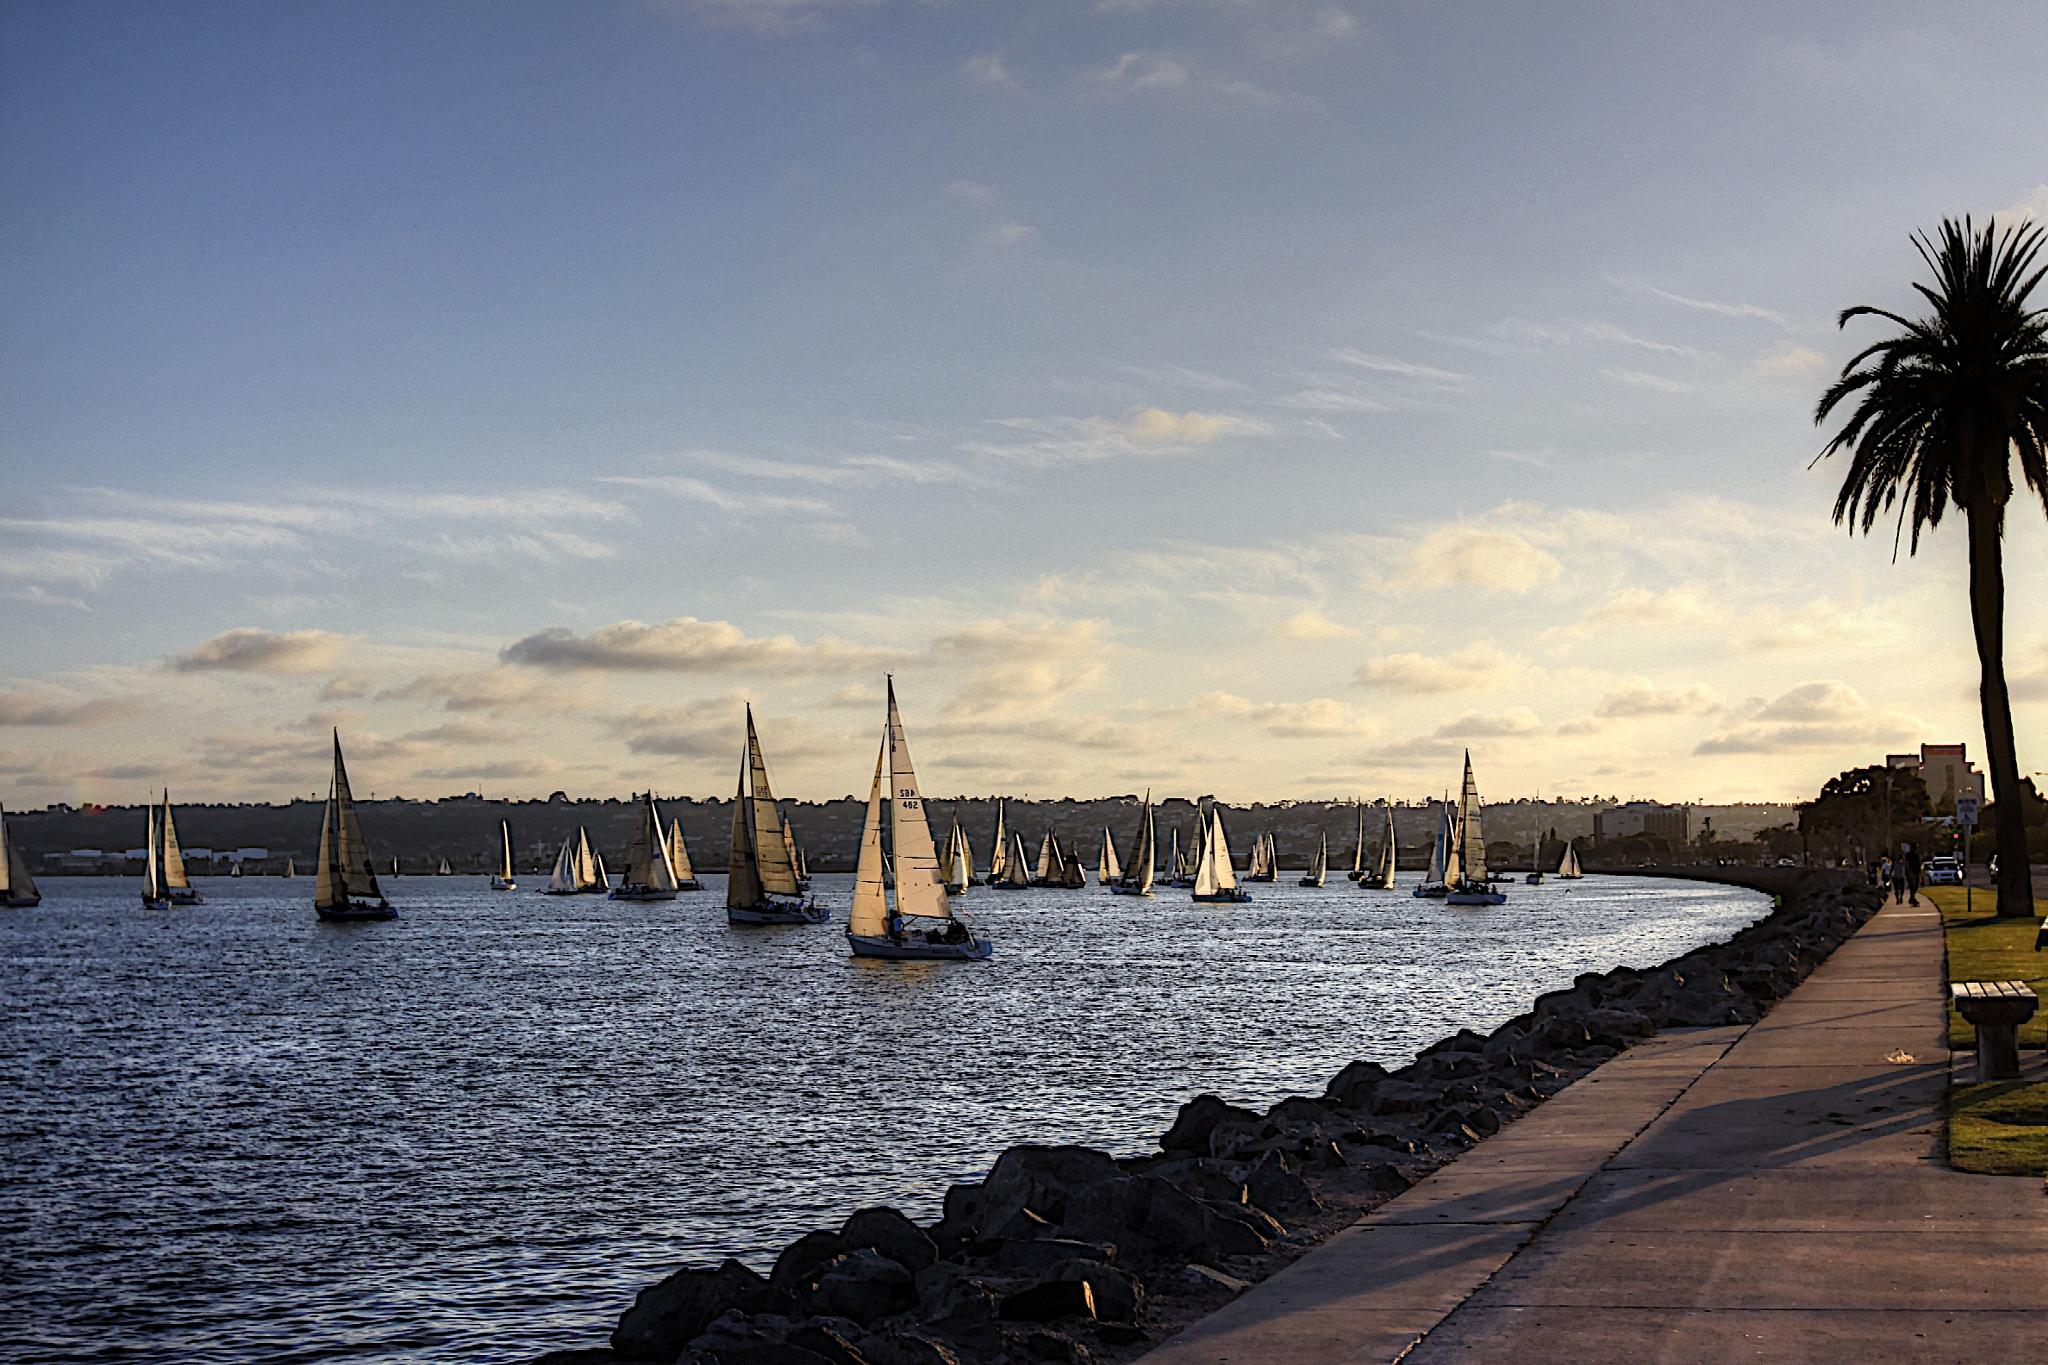 CA sailboats by Melanie Smith